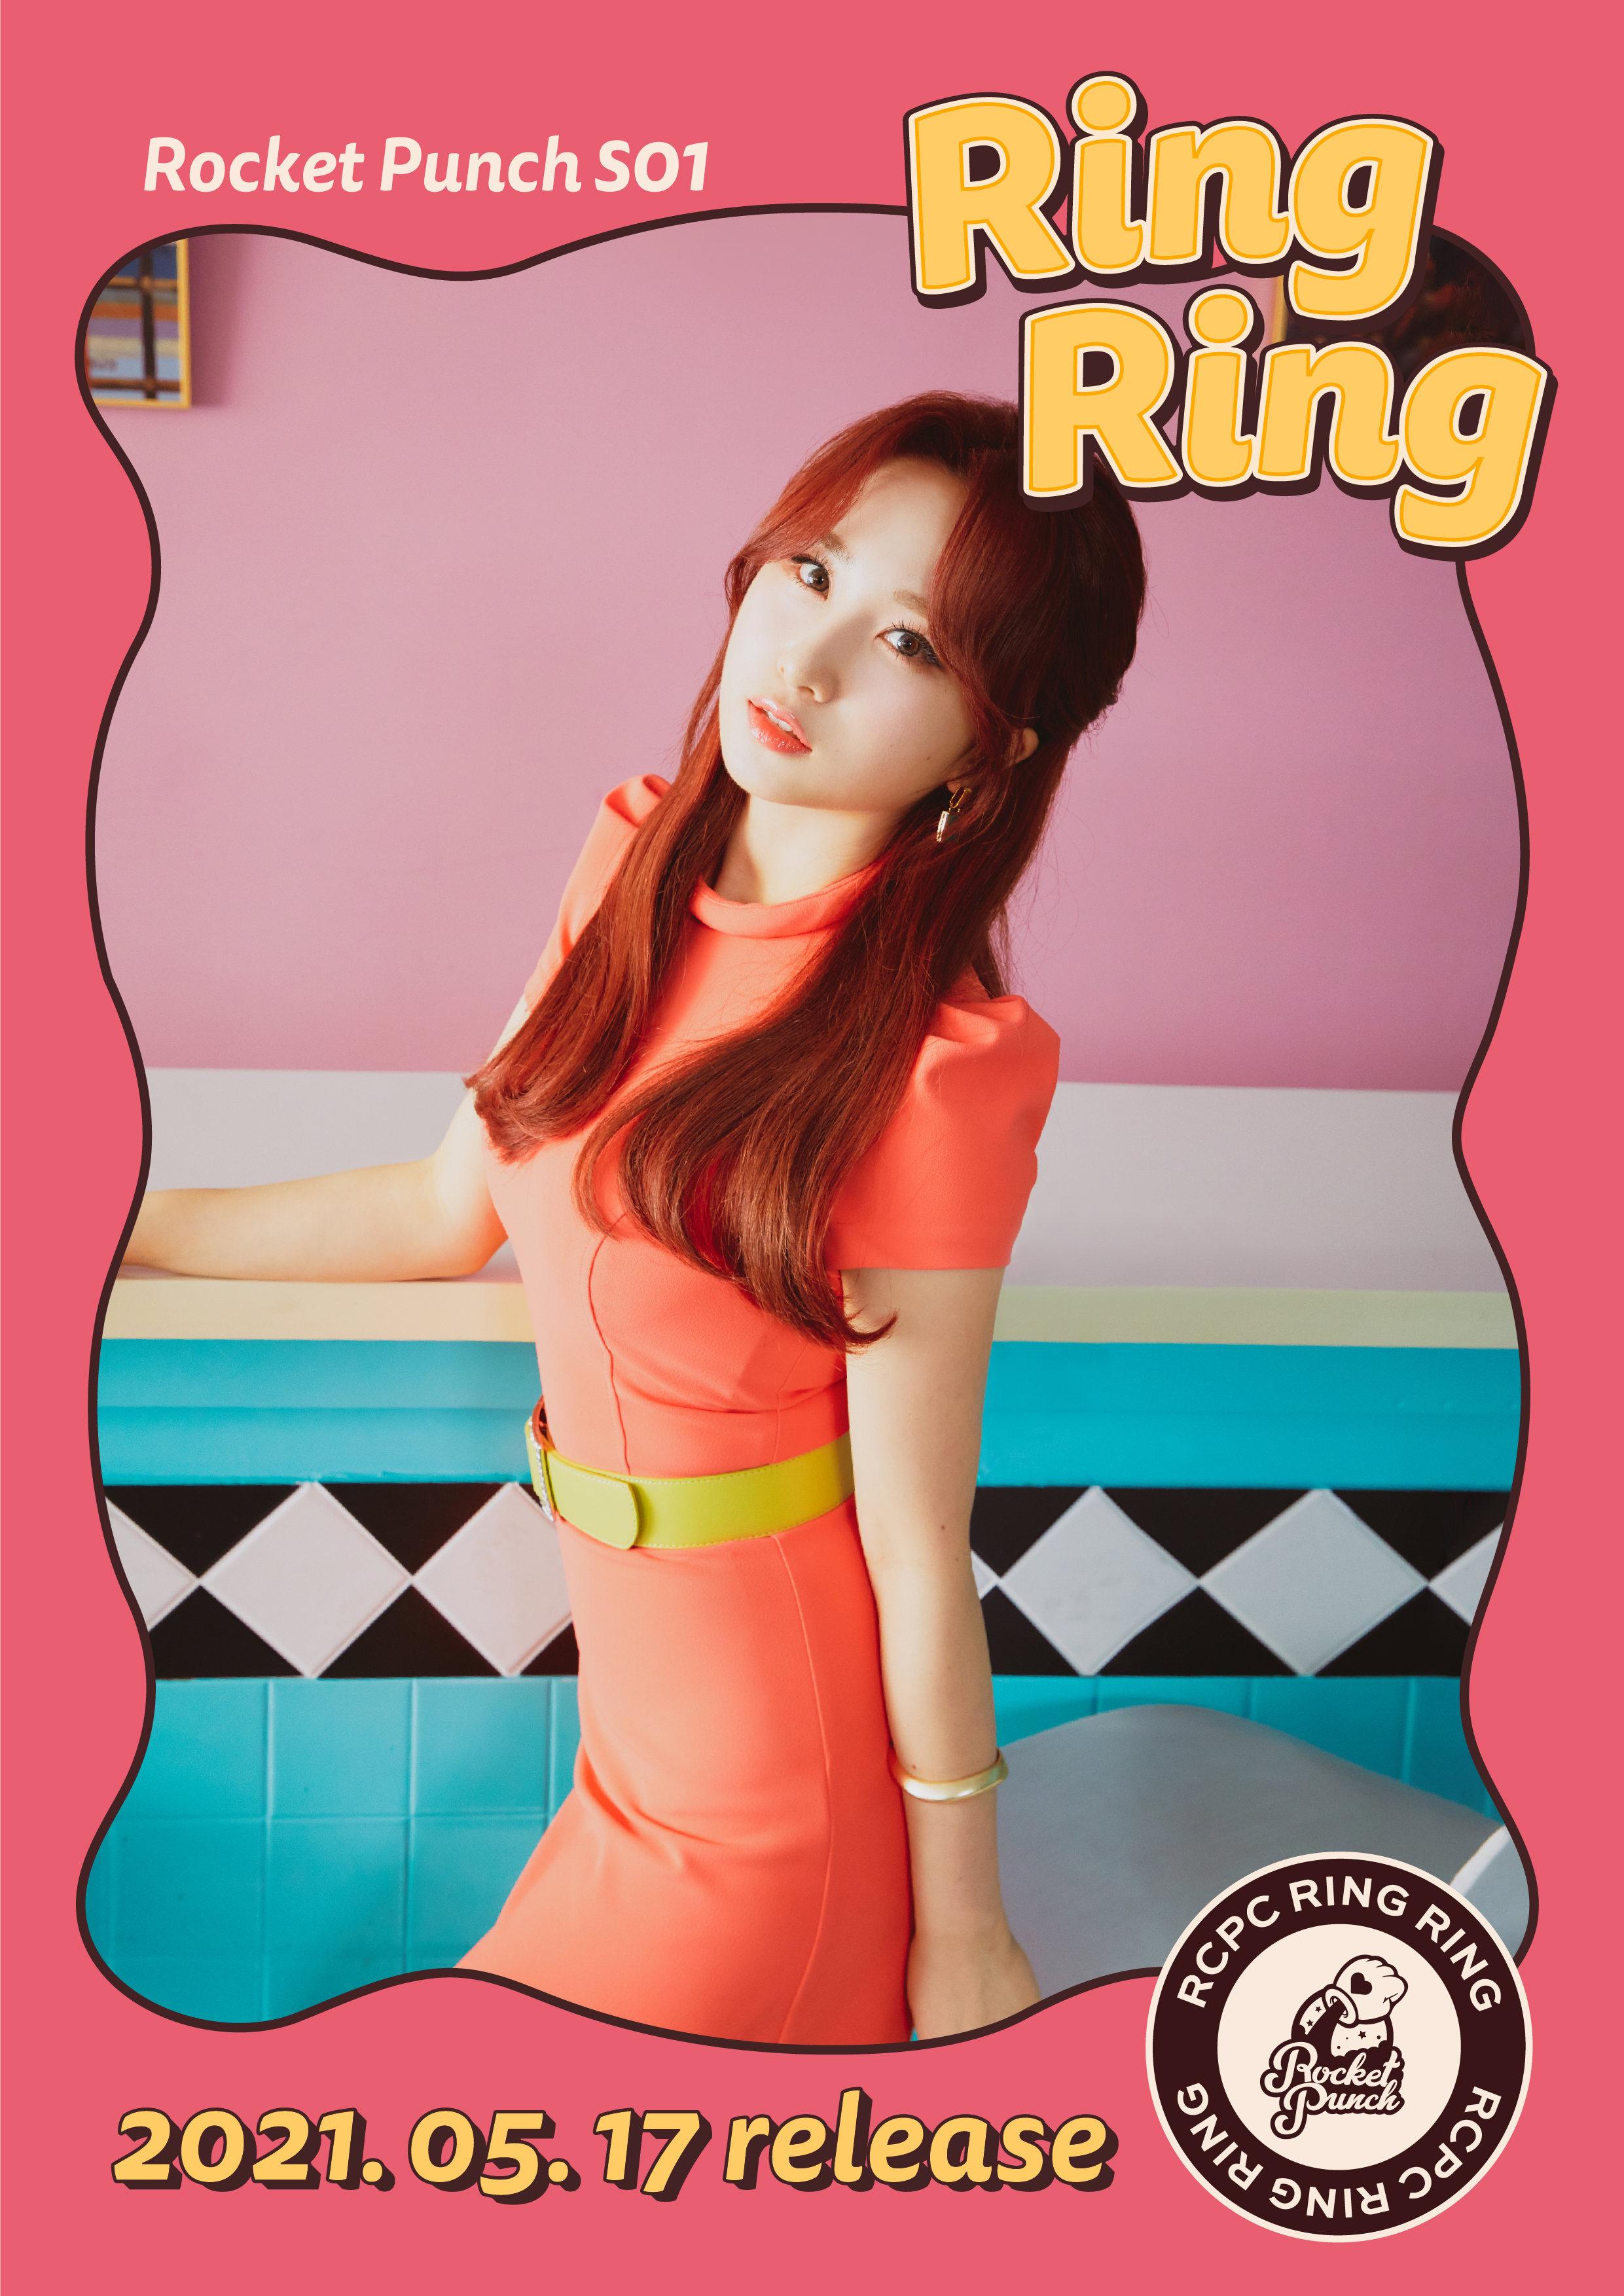 rocket_punch_ring_ring_teaser_juri_1